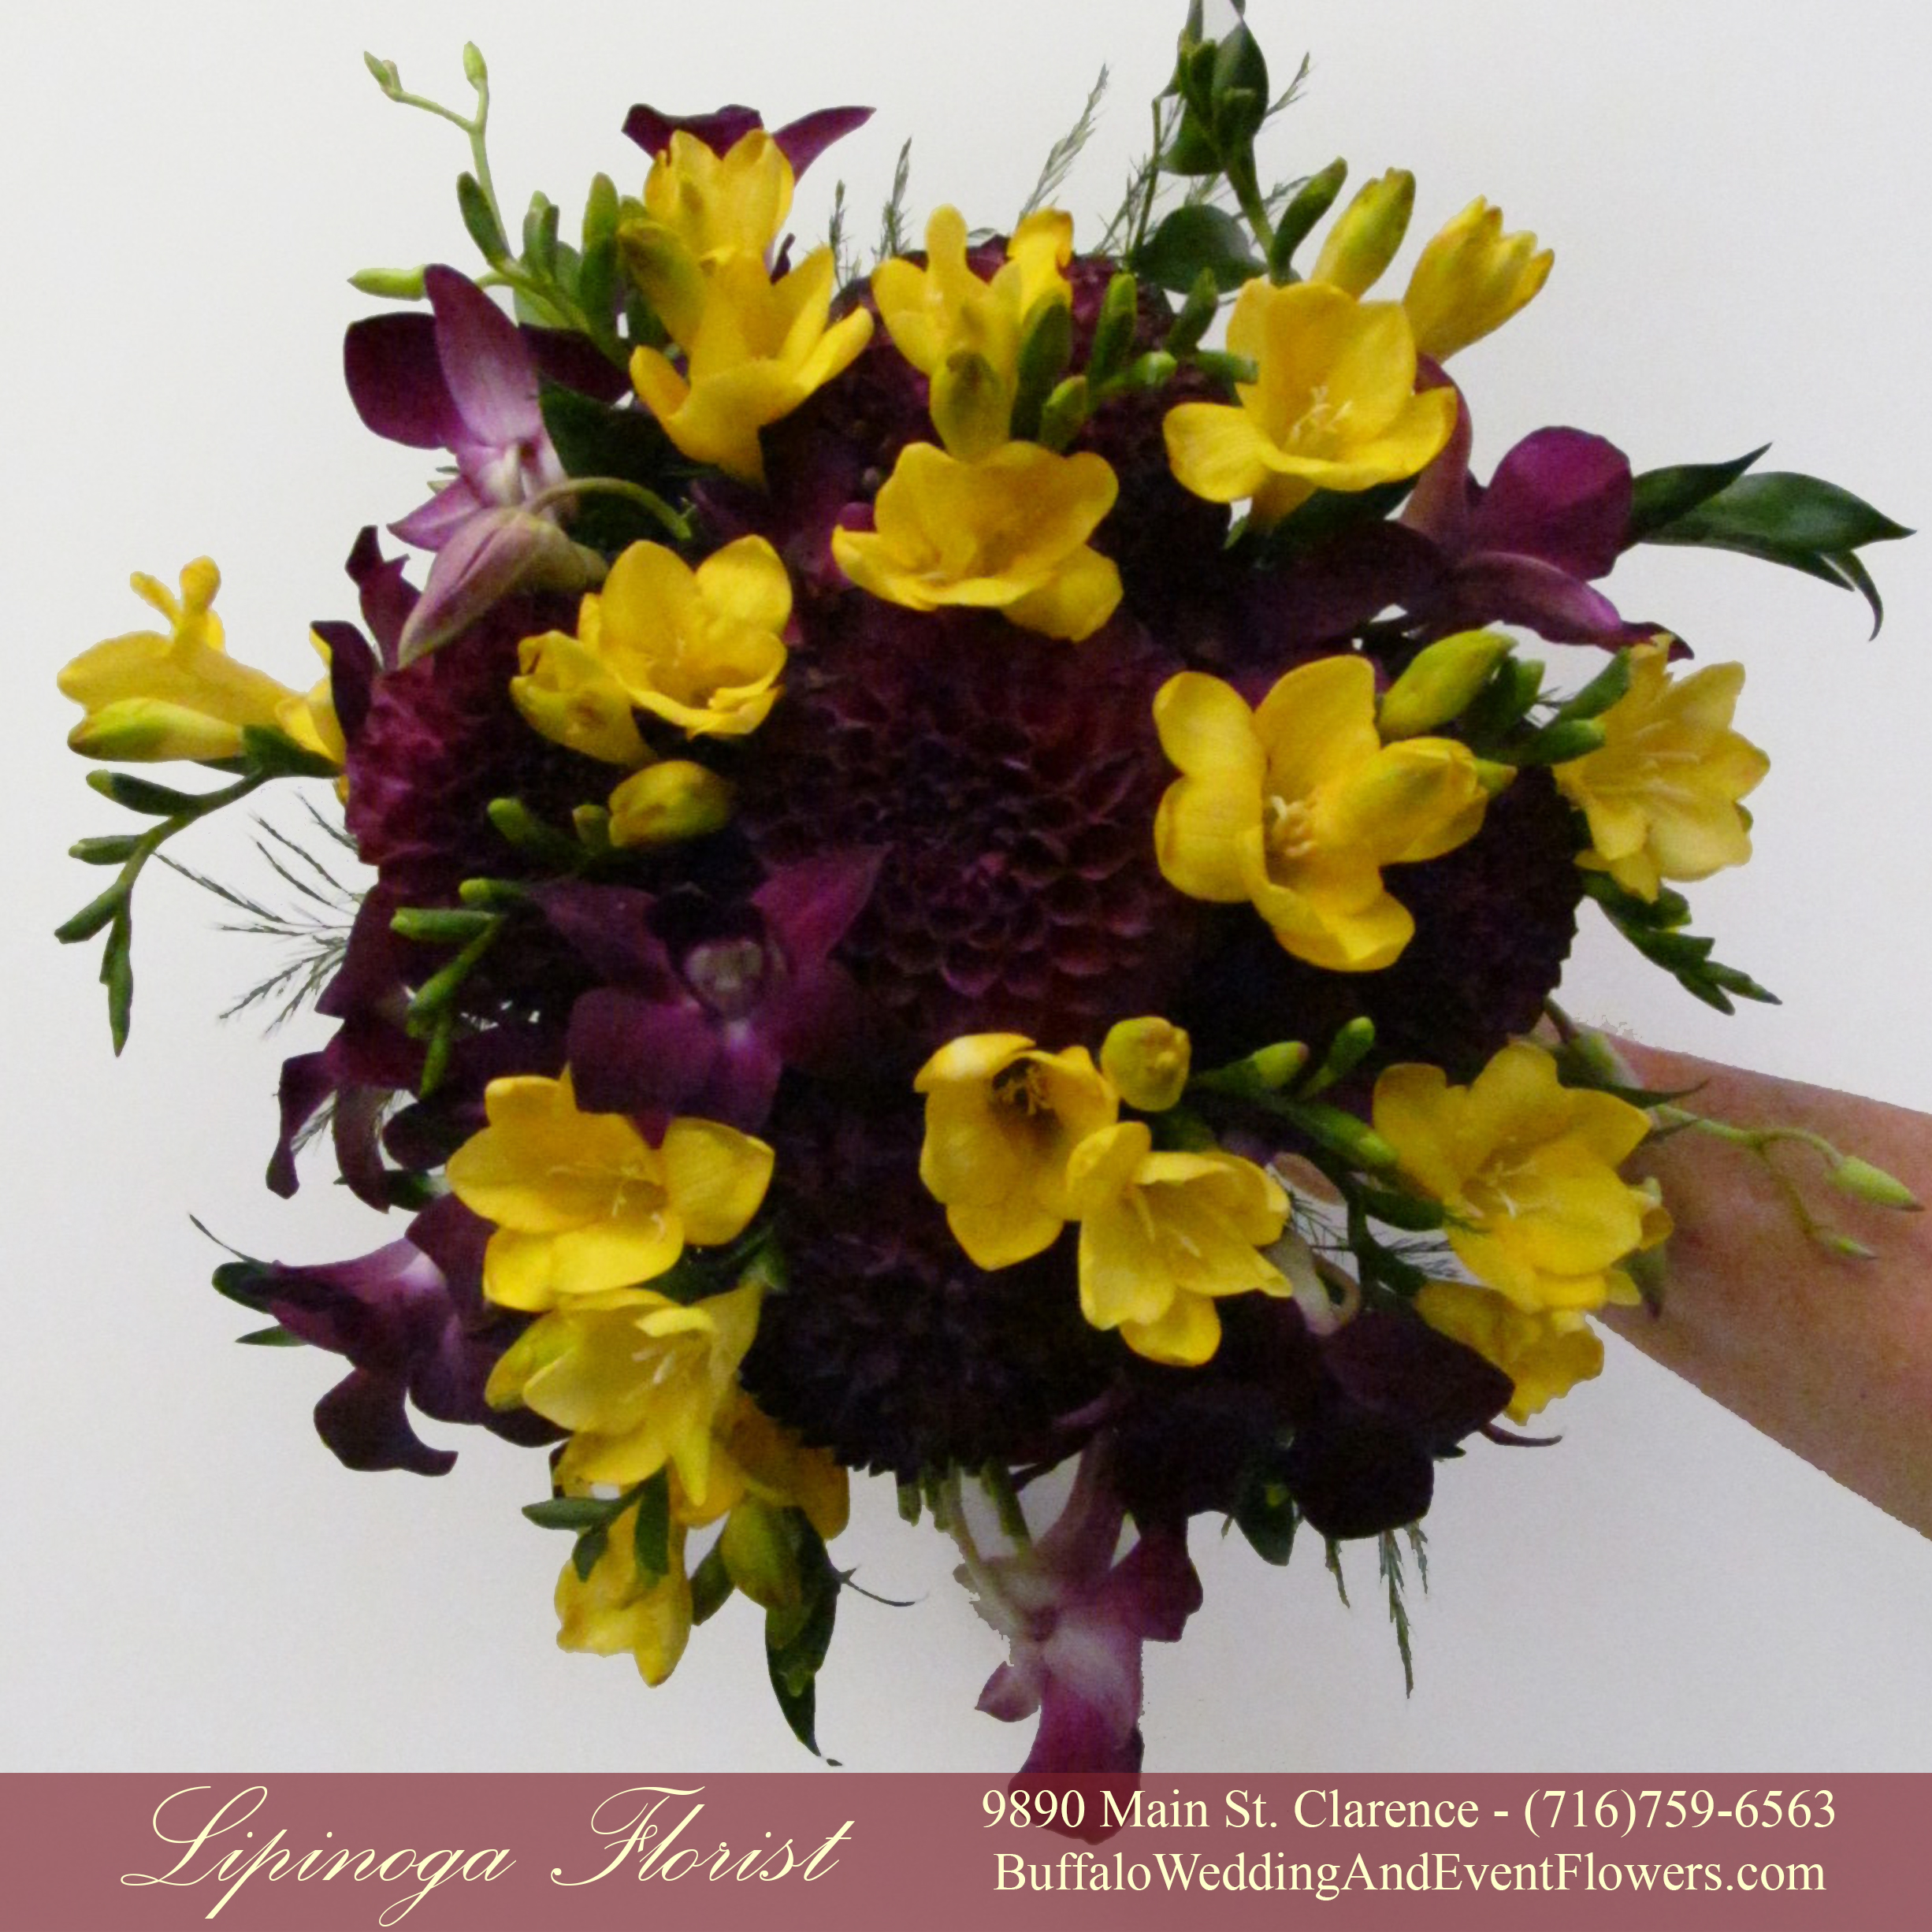 Bridal Bouquet Buffalo Wedding Event Flowers By Lipinoga Florist